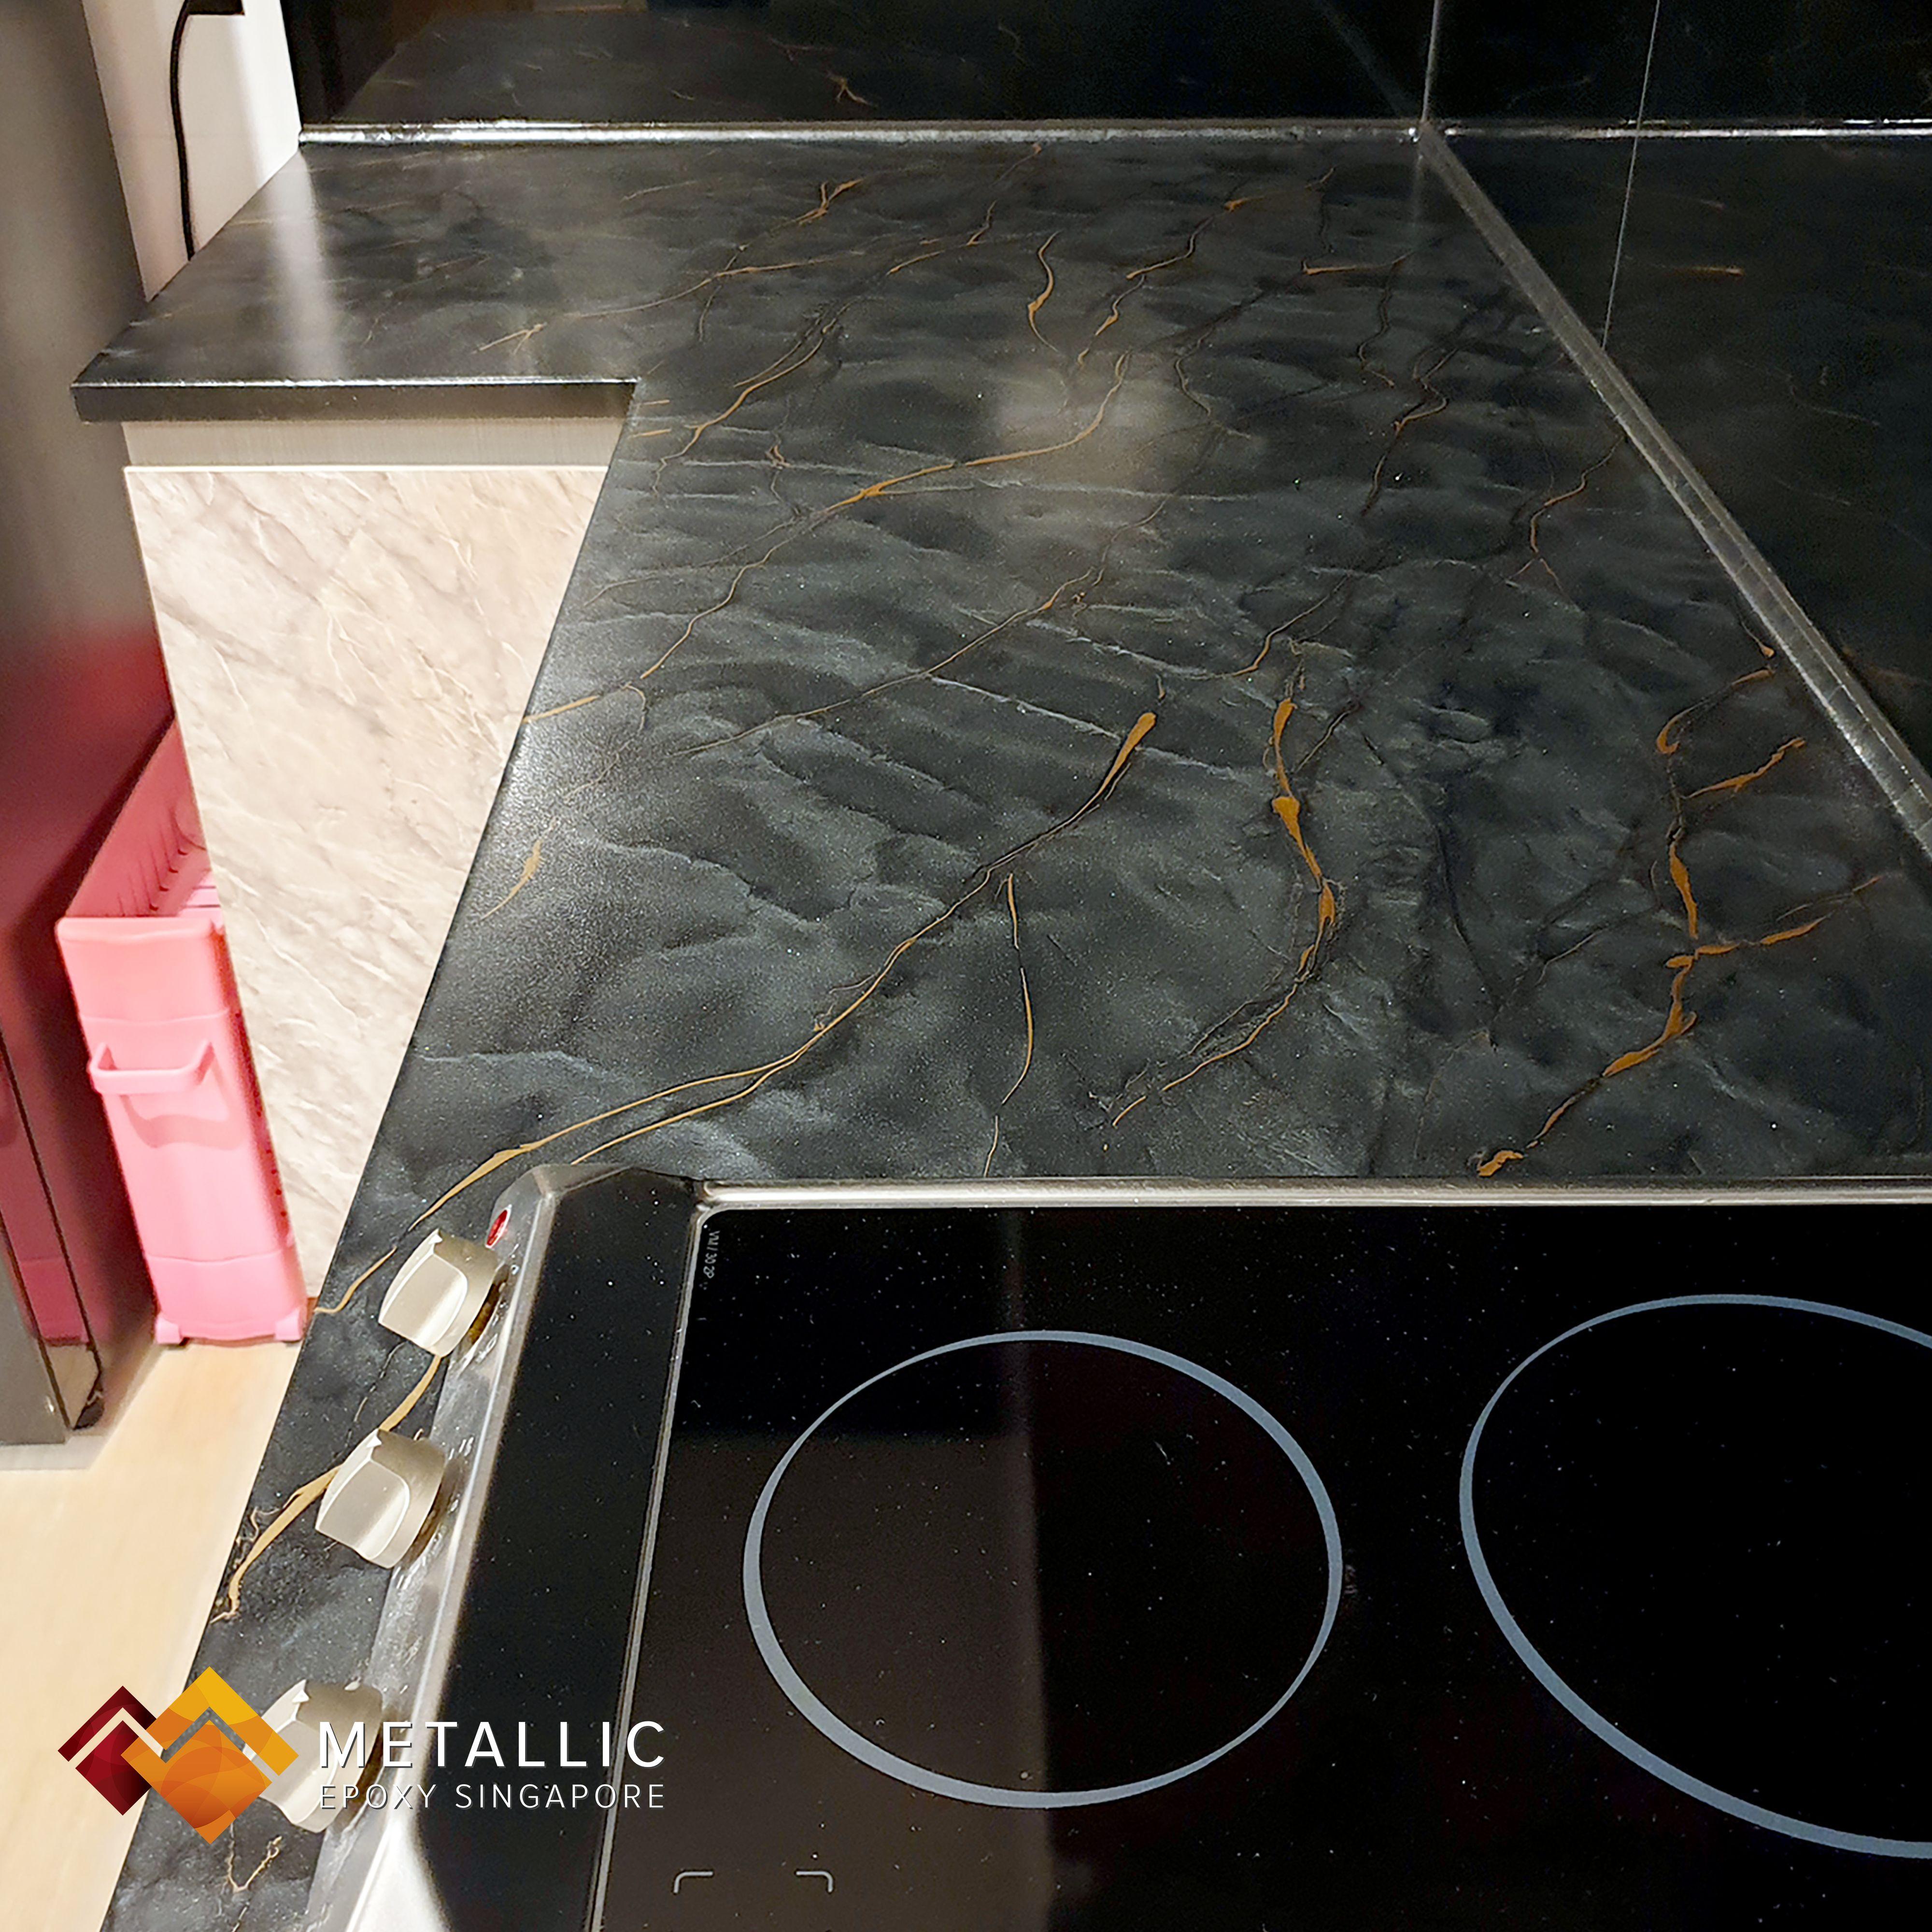 Pin On Metallic Epoxy Countertop Design Ideas